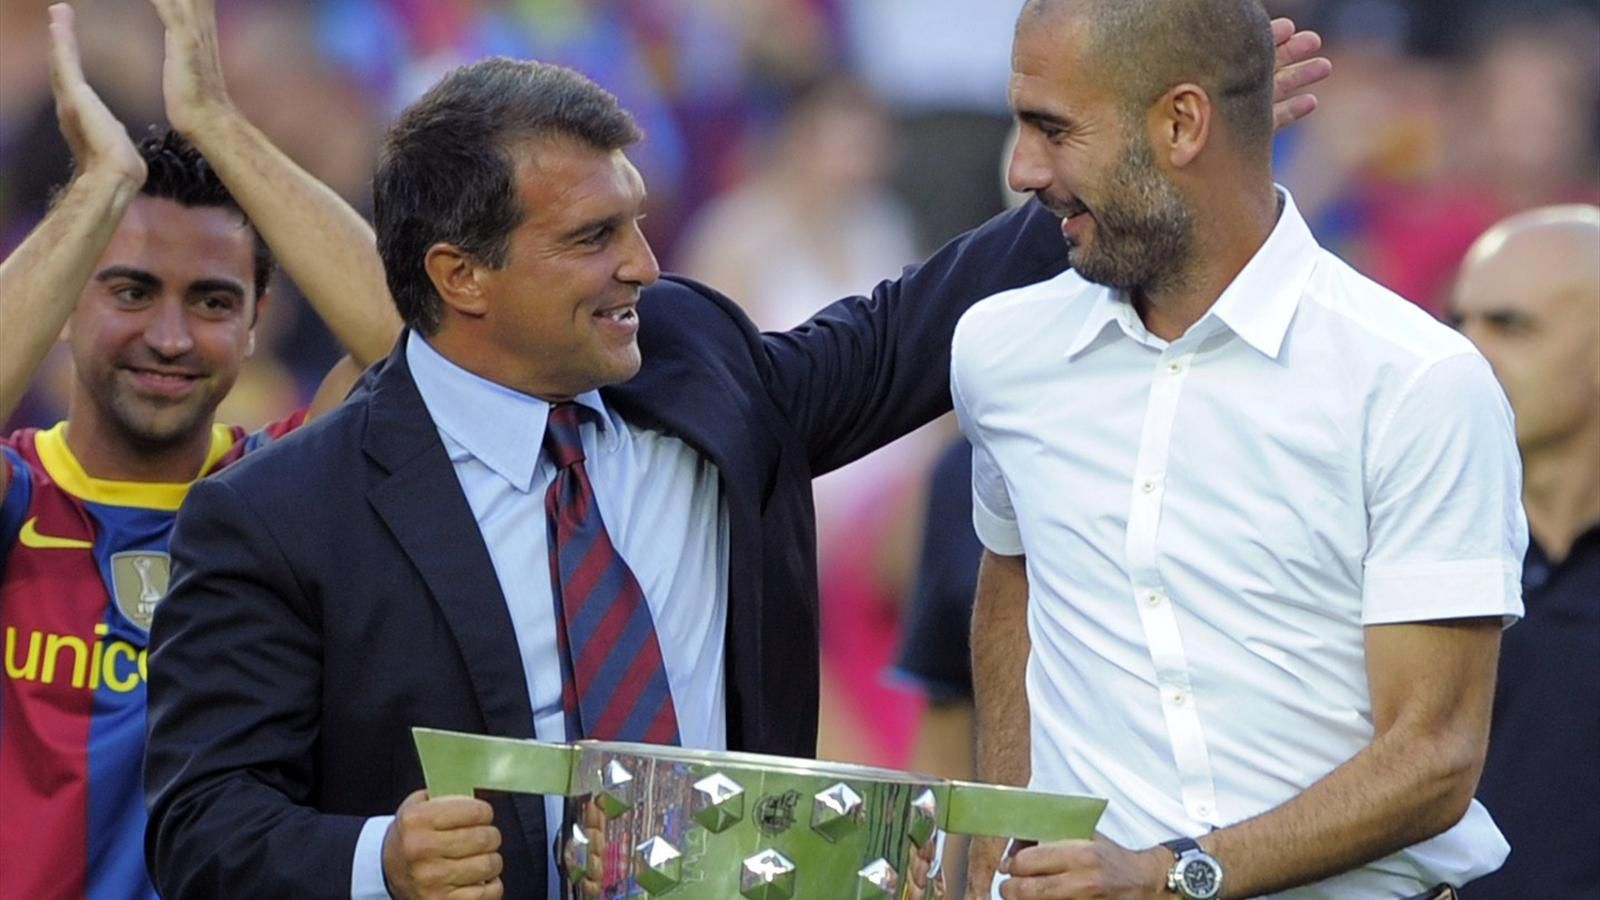 Laporta announces with striking promise in Barça race: 'I want Guardiola back' - Bóng Đá